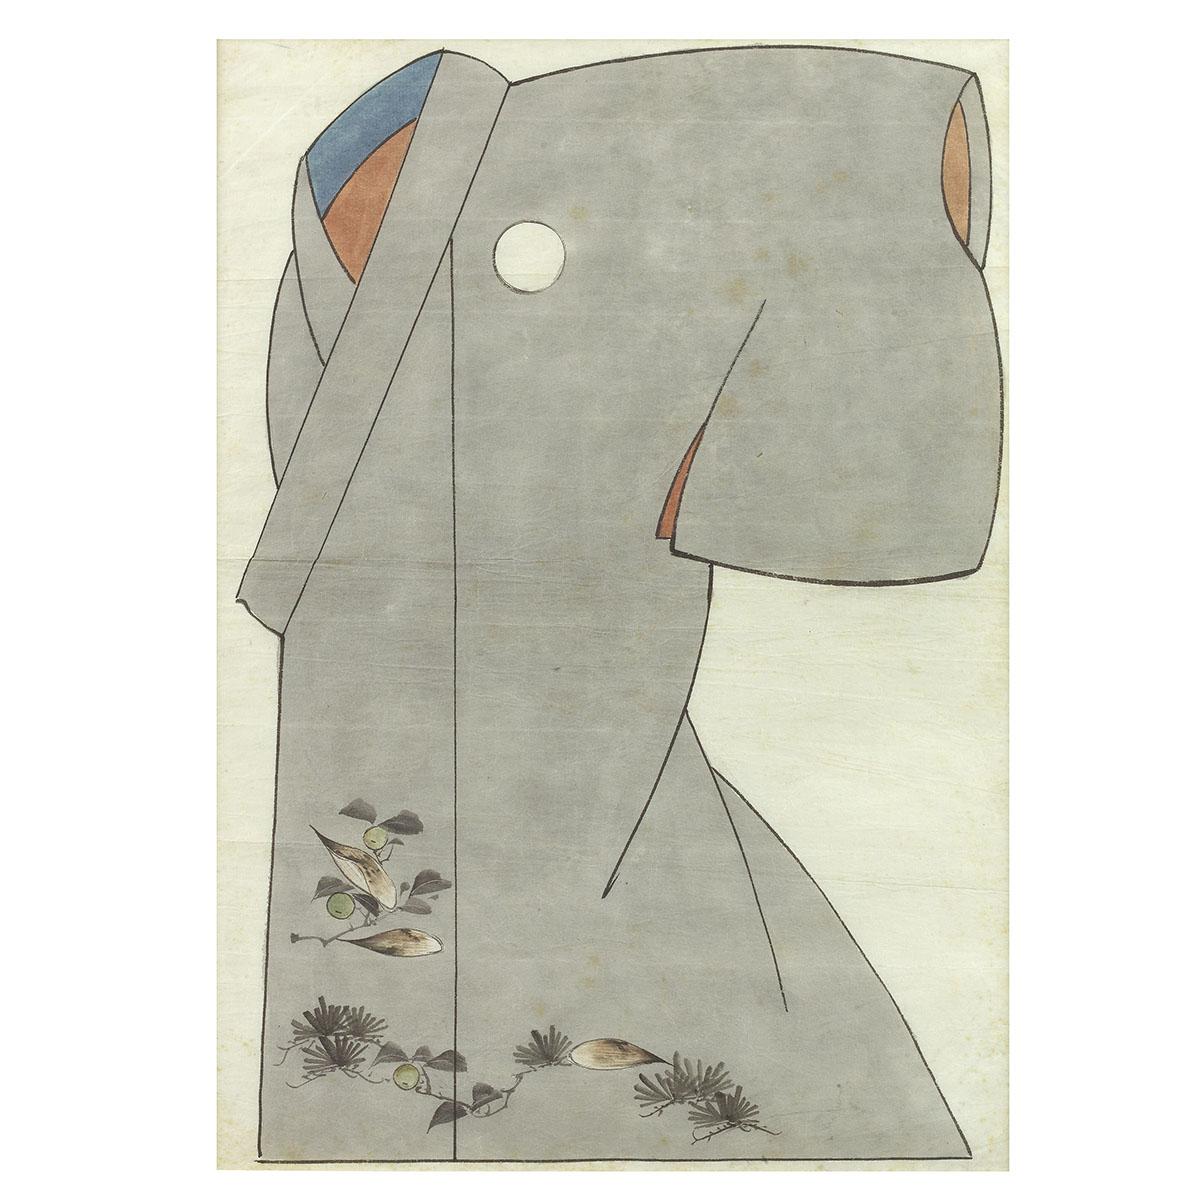 Aquarellstudie eines grauen Kimonos